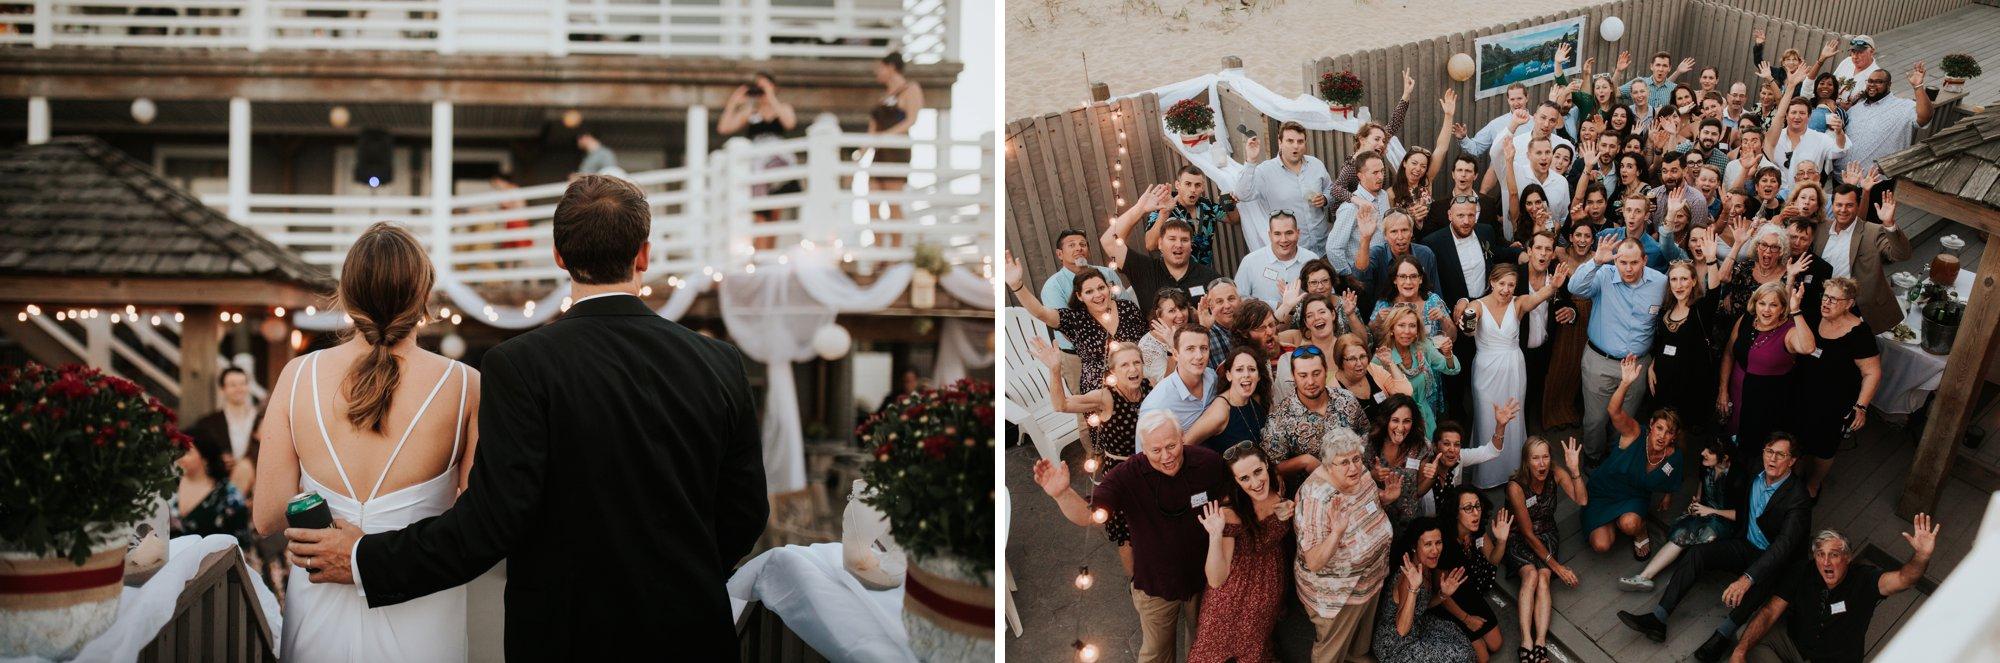 Low key backyard beach wedding in Sandbridge, VA party